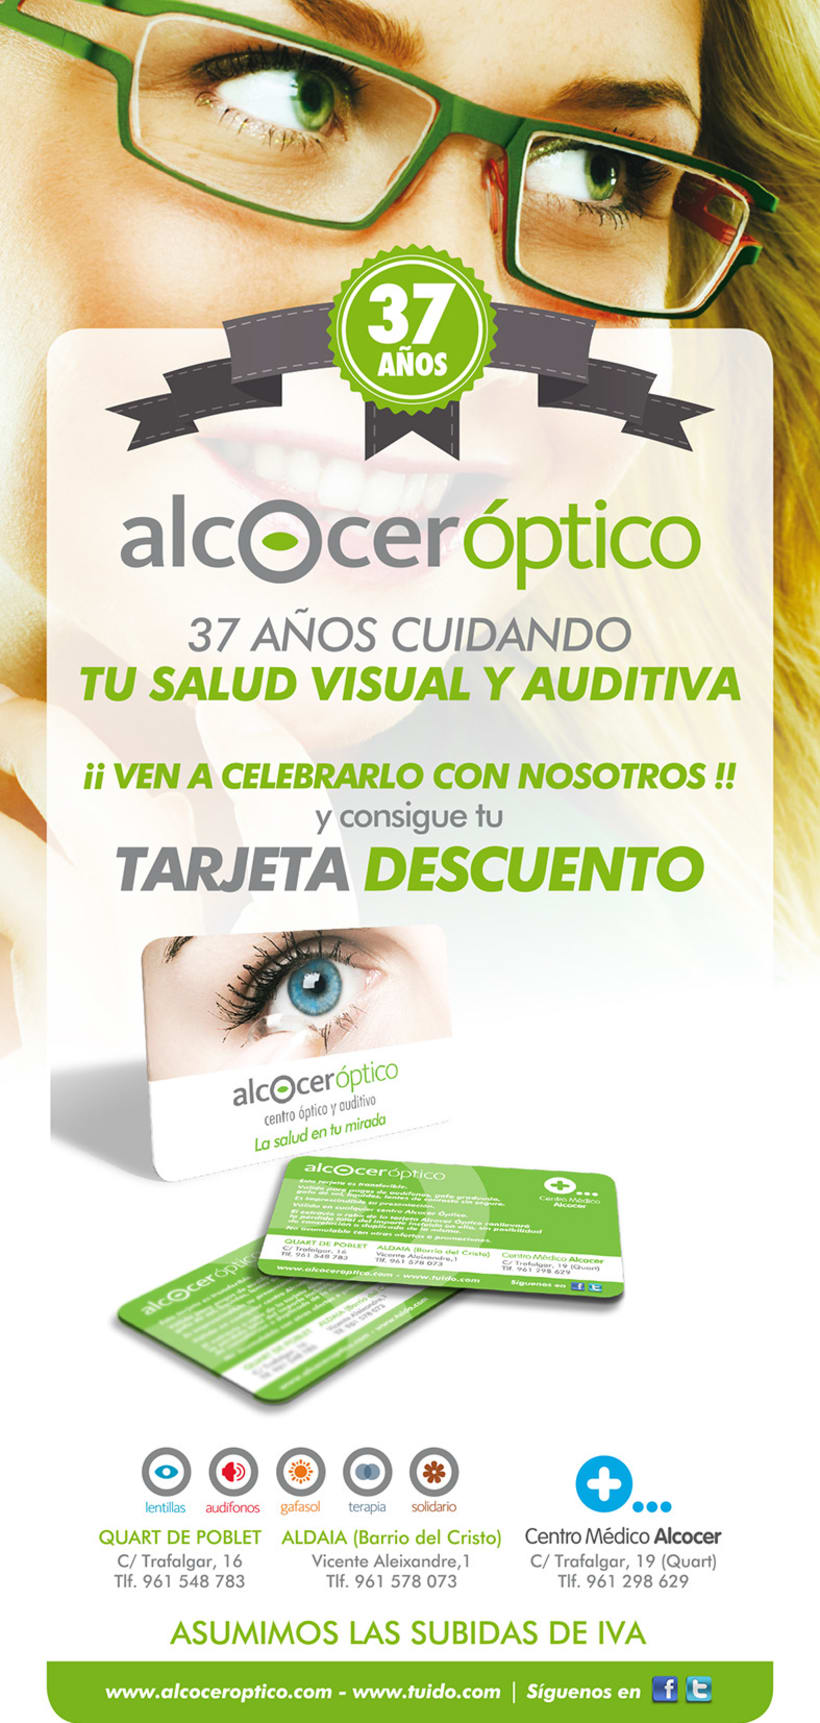 Alcocer Óptico 5